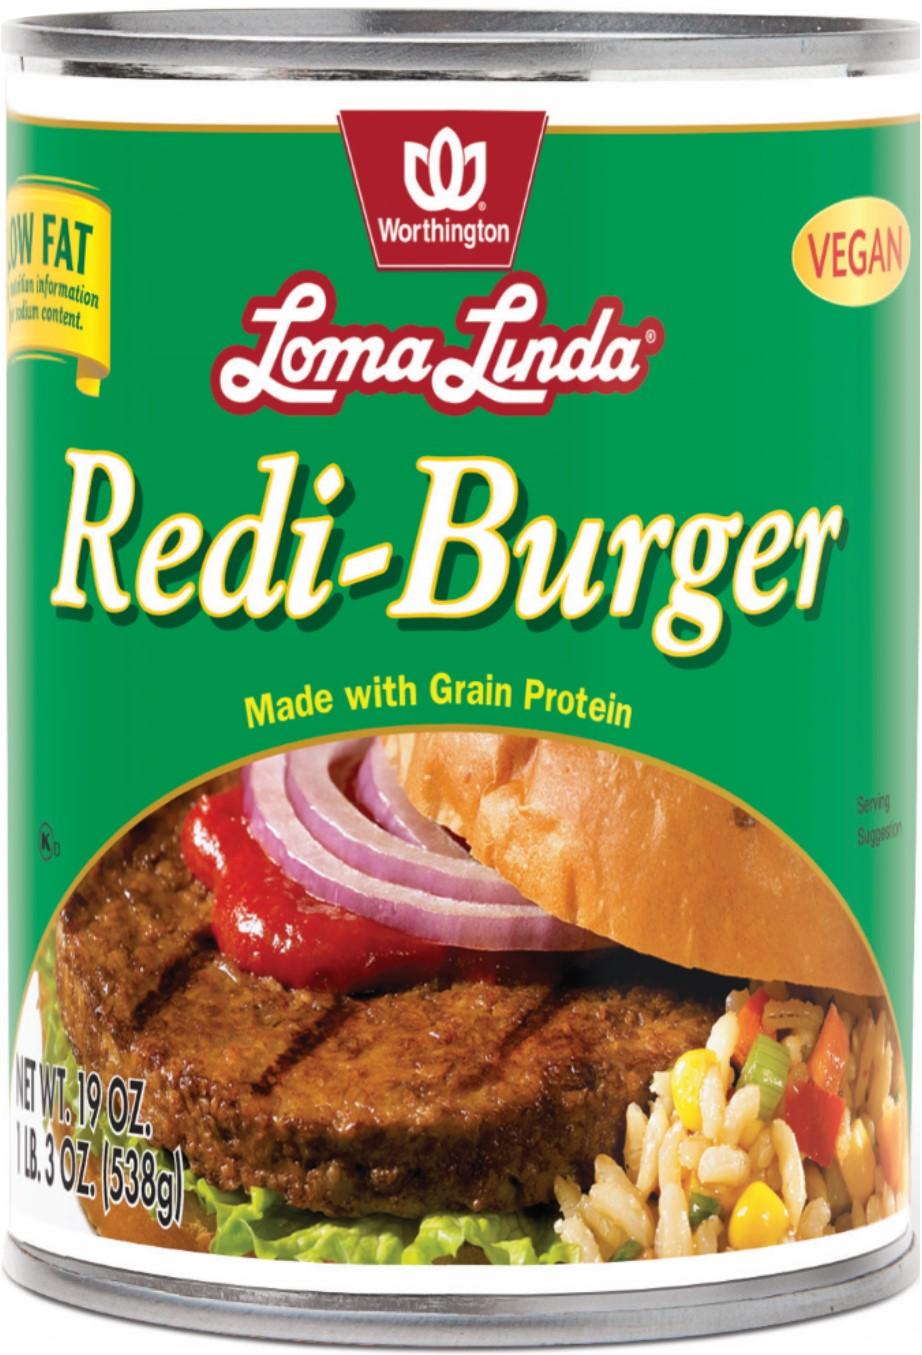 REDI BURGER LOW FAT CASE,LOMA LINDA LF,100056